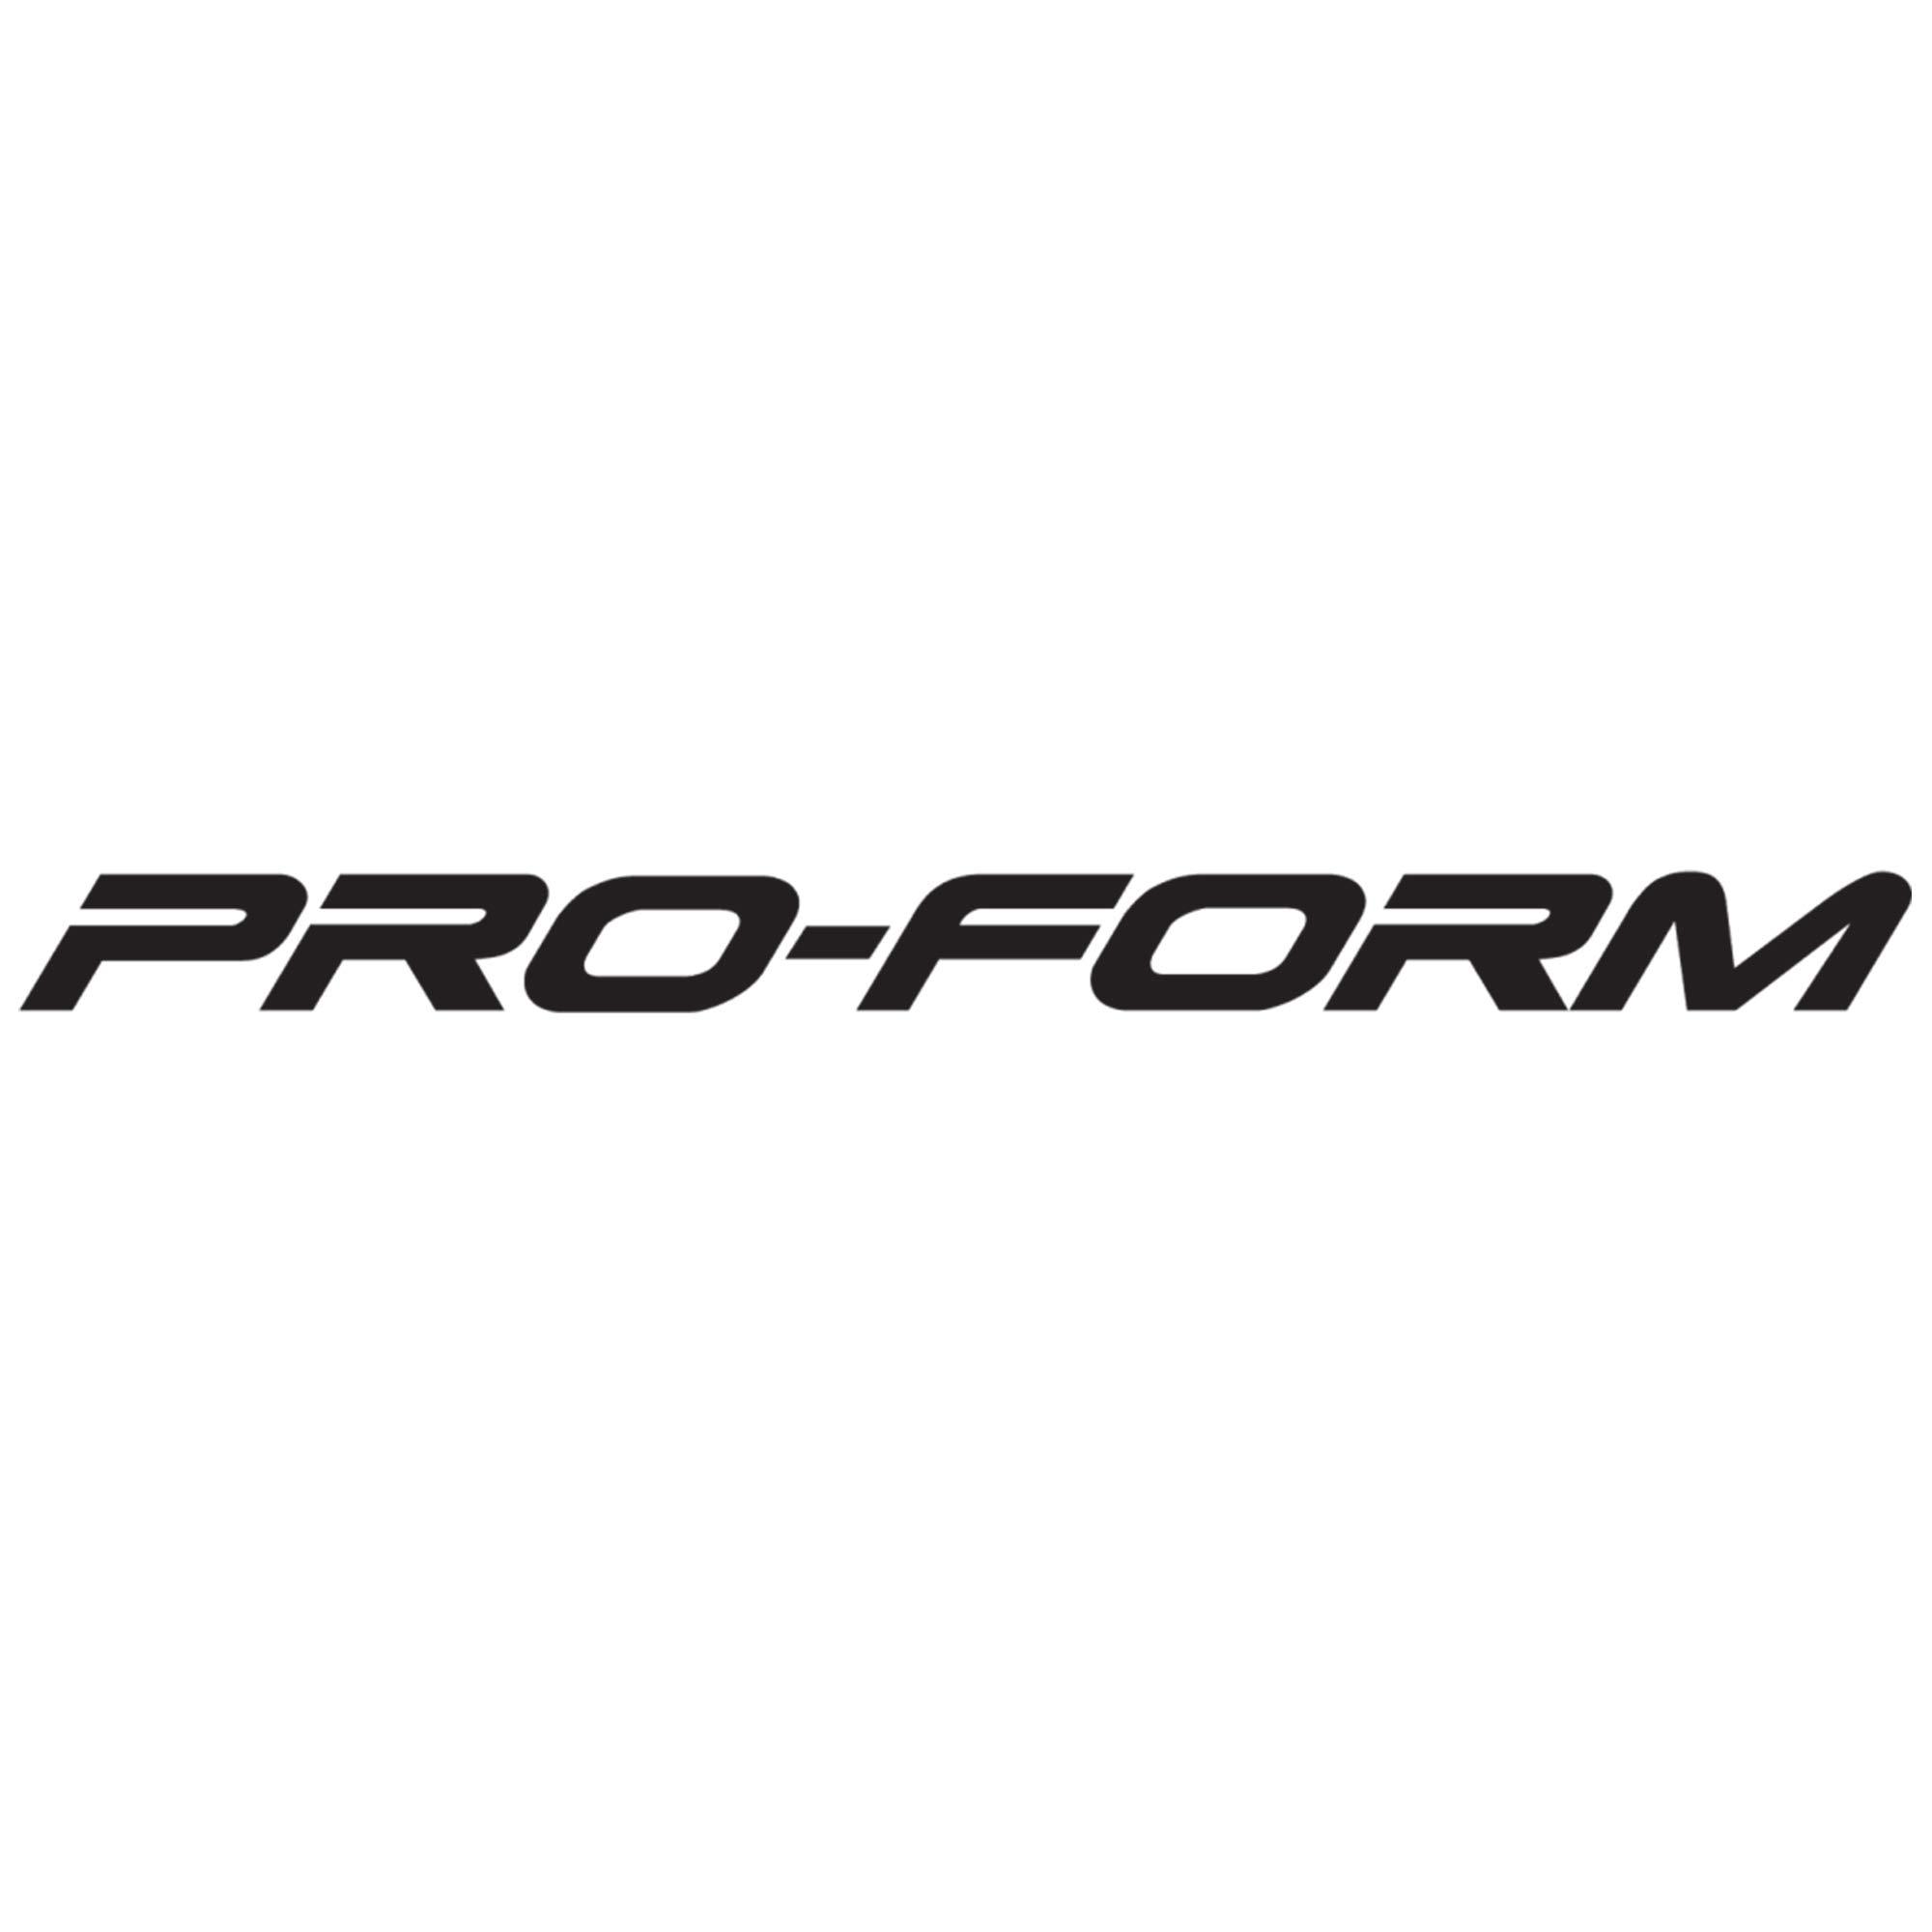 Proform Lifestyler 174491 Treadmill Rear End Cap Genuine Original Equipment Manufacturer (OEM) Part by Proform Lifestyler (Image #2)